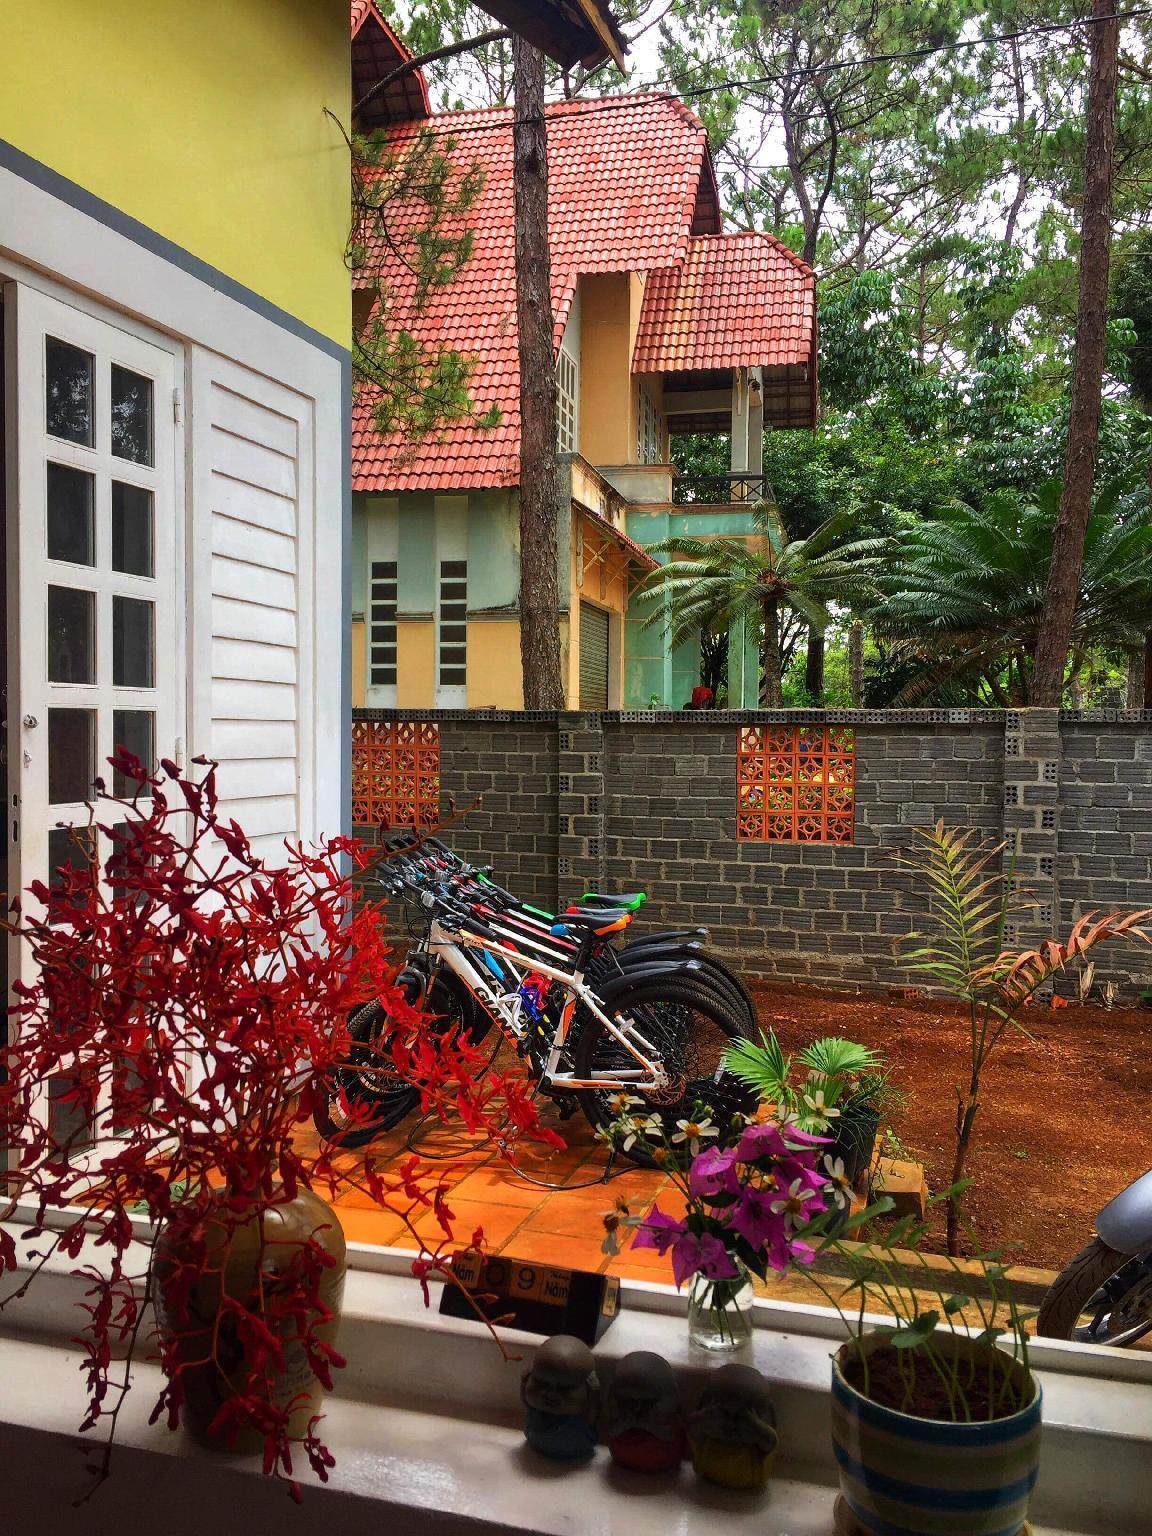 La Maison homestay Mang Den, Kon Plông